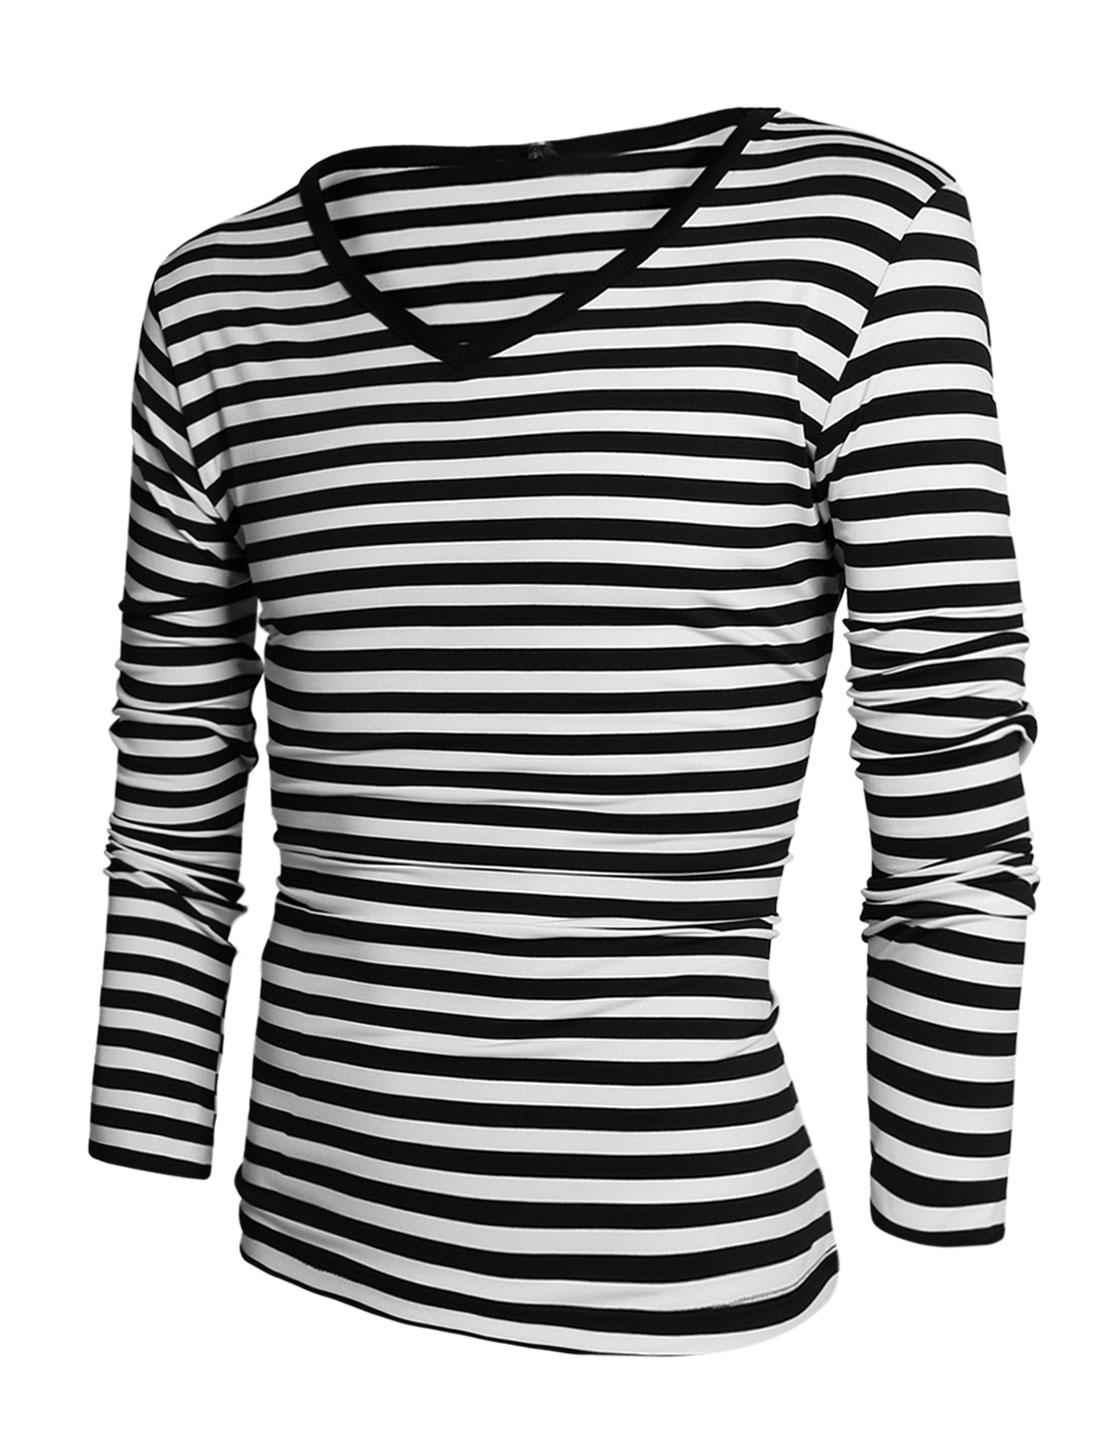 Men Stripes V Neck Long Sleeves Casual Piped Tee Shirt White Black M